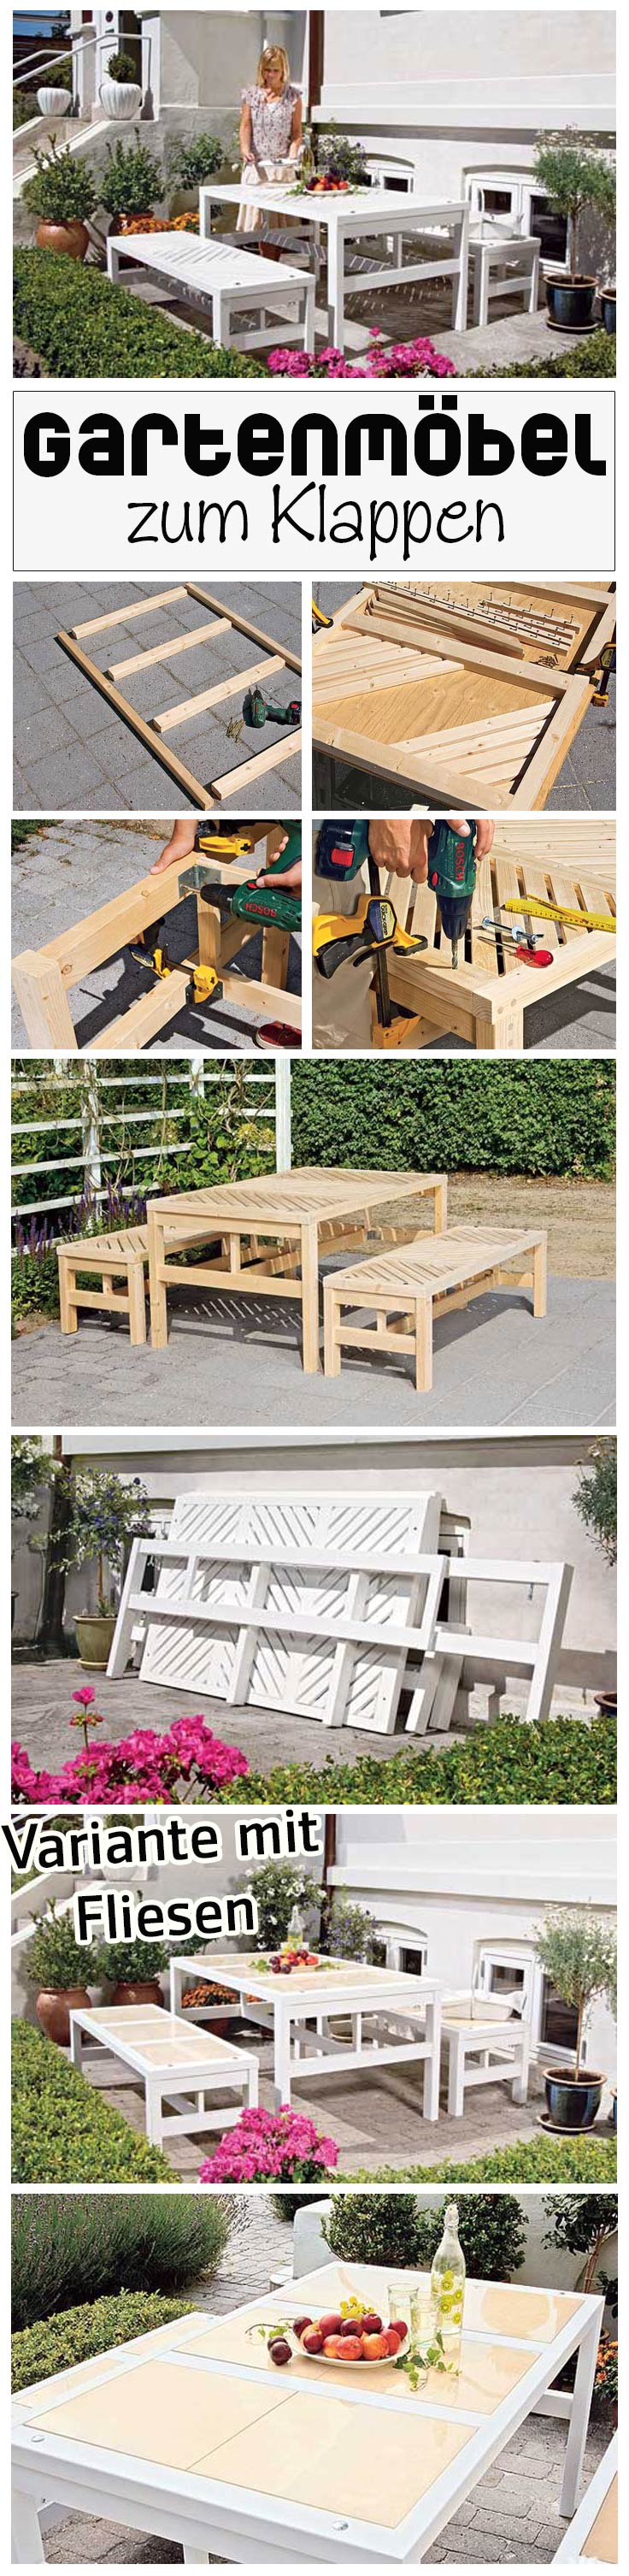 Gartenmöbel zum Klappen Garten, Gartenmöbel selber bauen